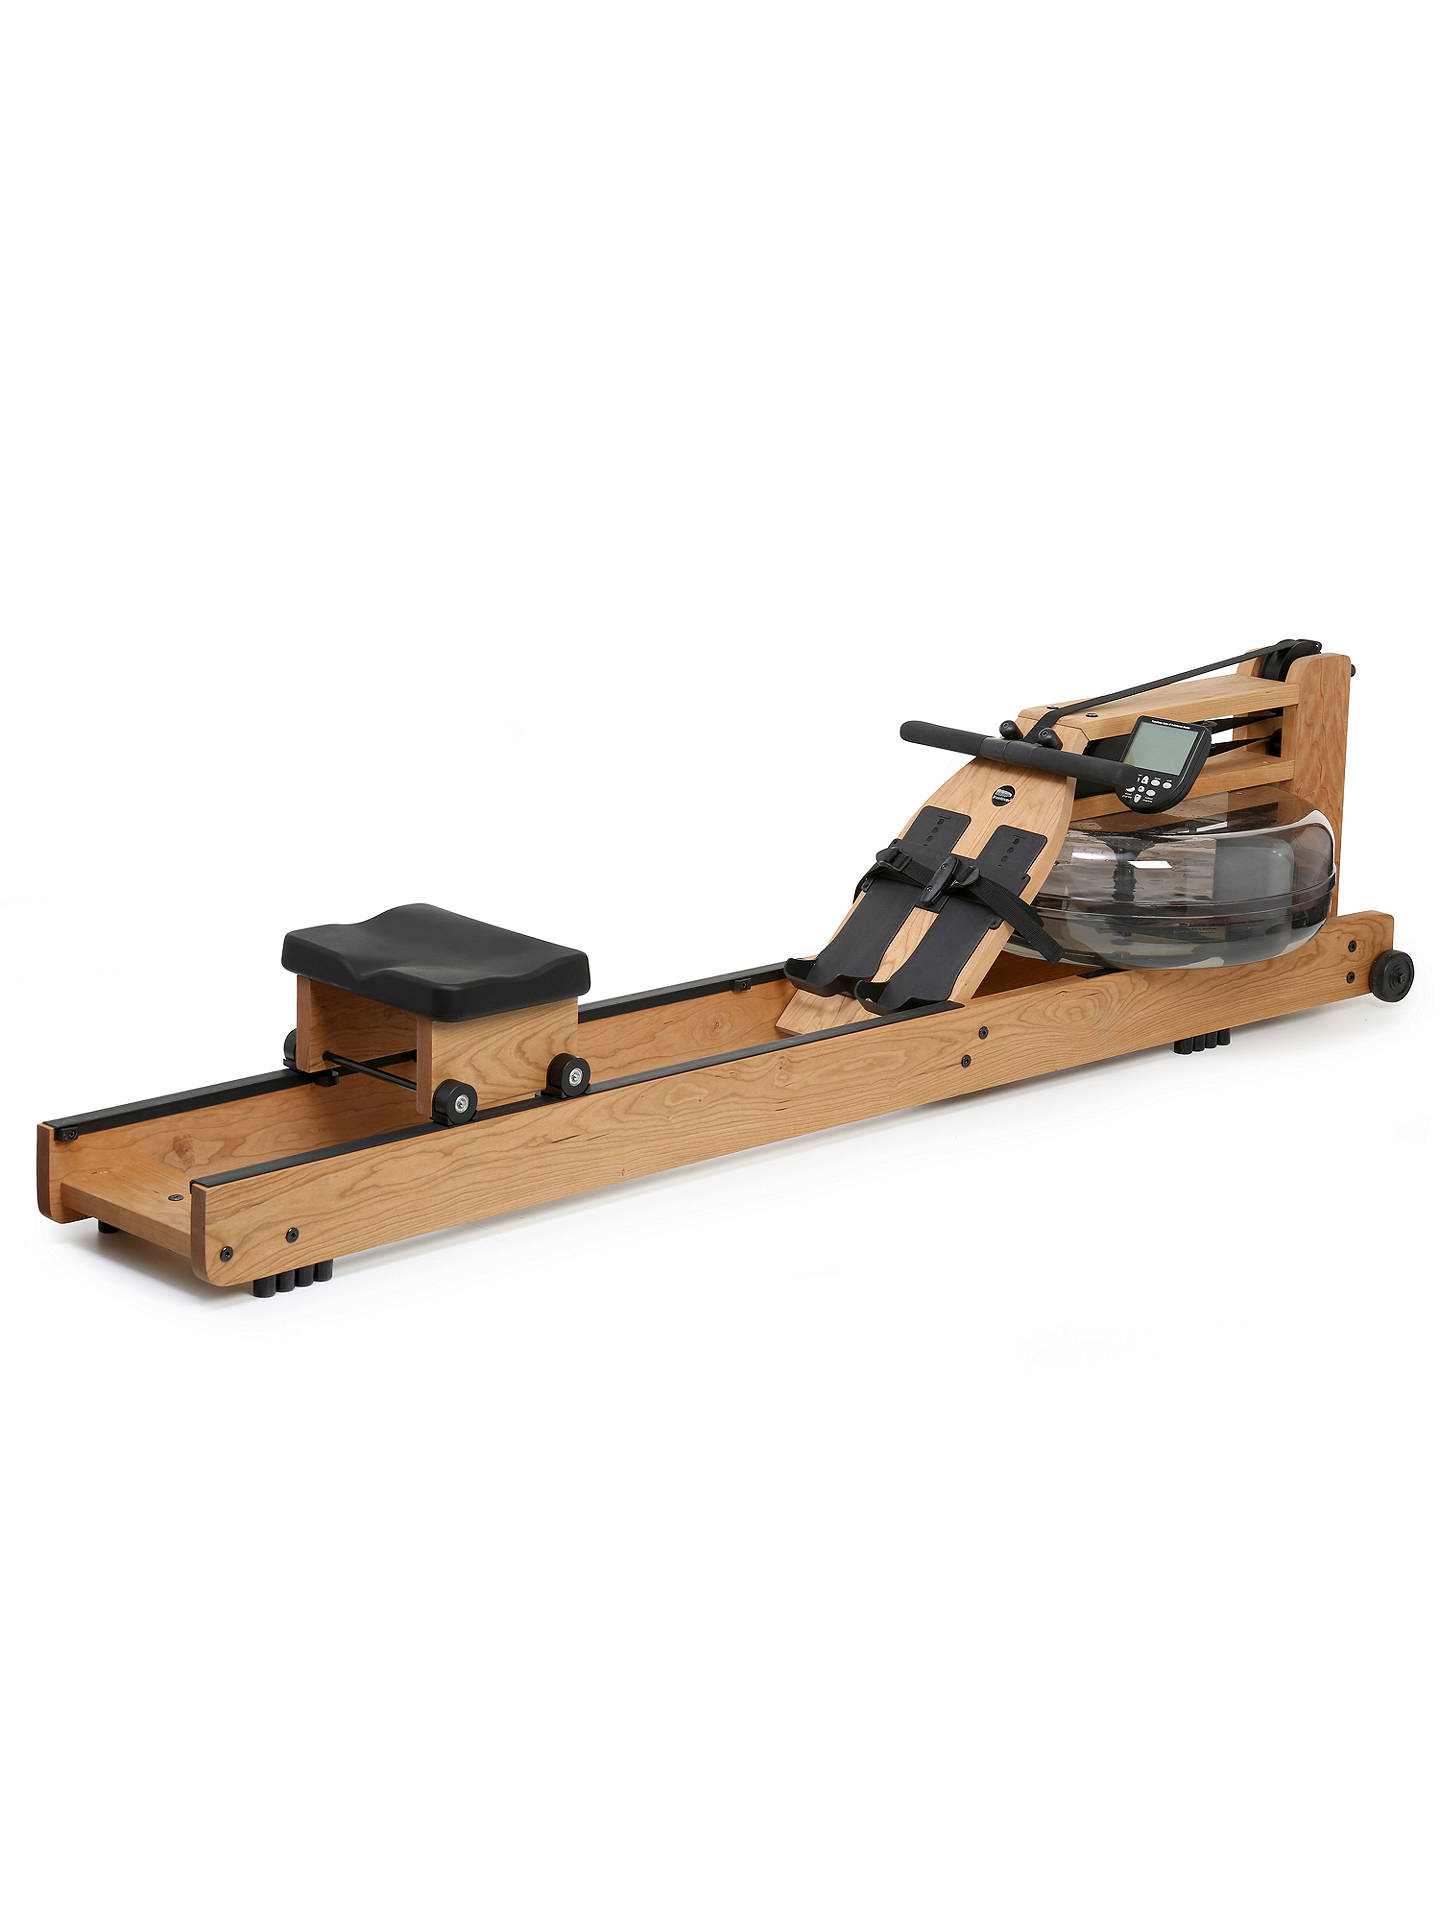 WaterRower Oxbridge Rowing Machine with S4 Performance Monitor, Cherry Wood